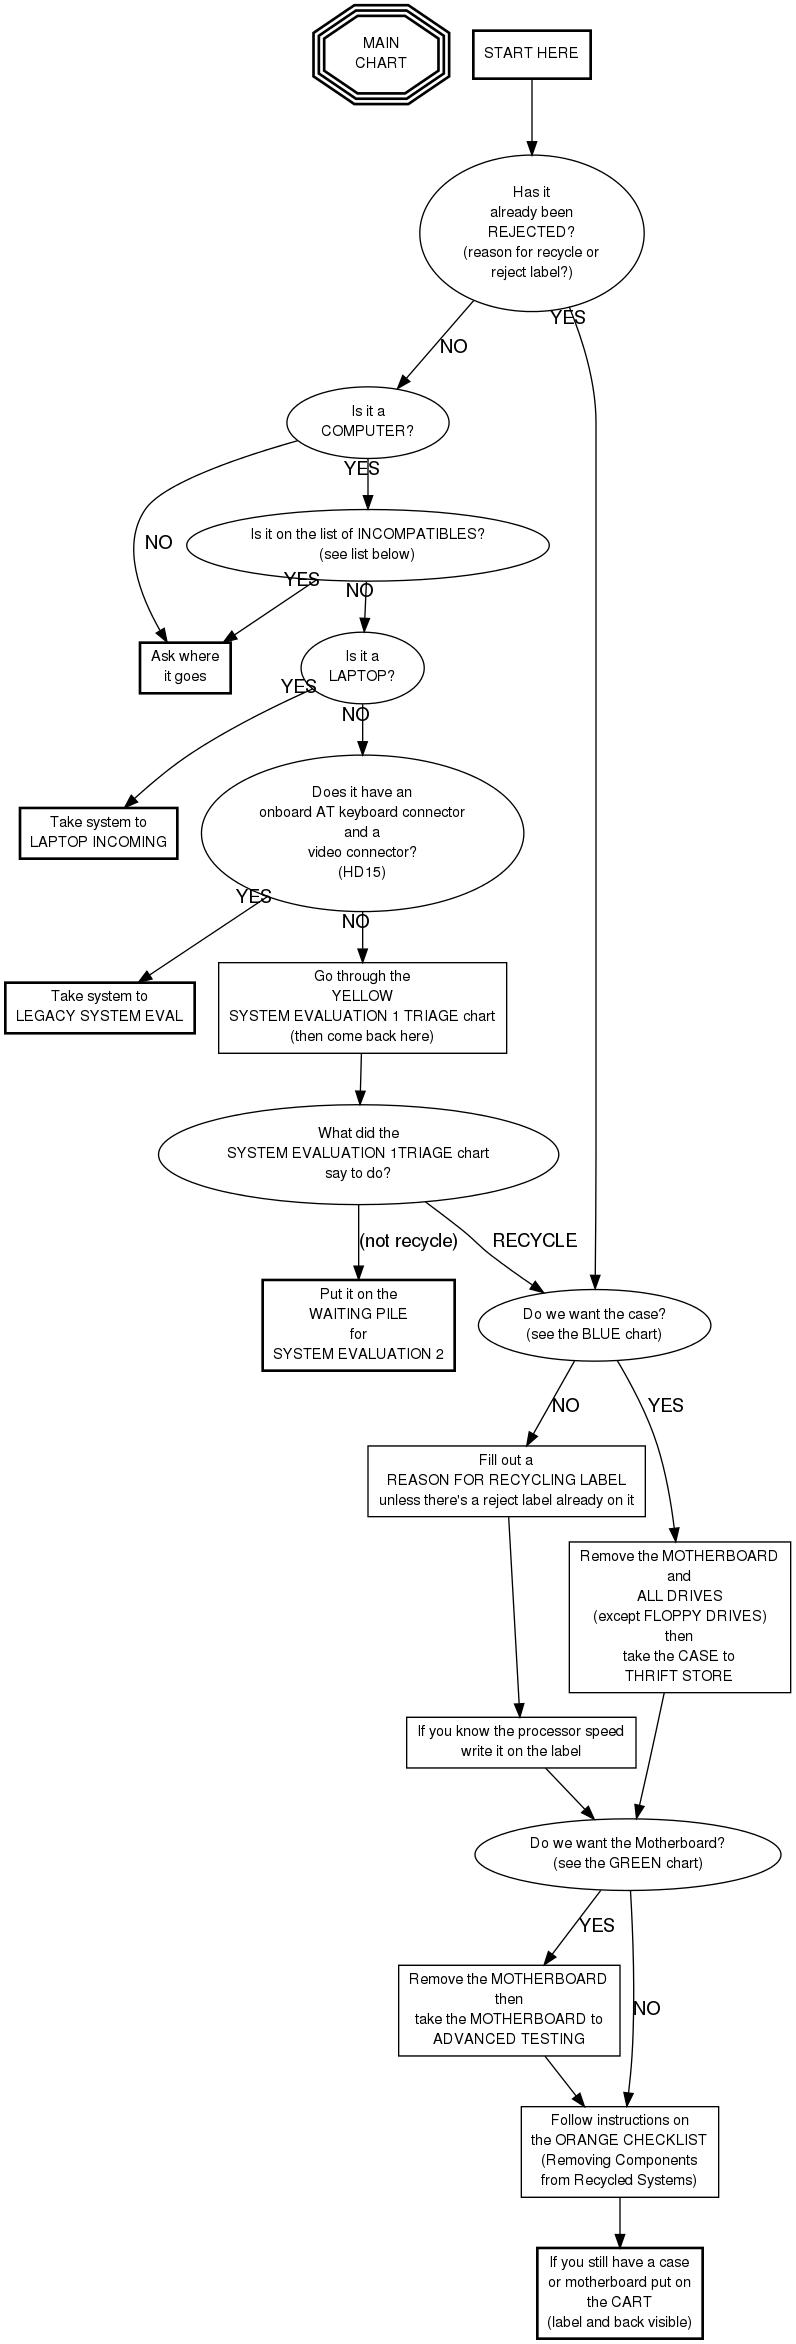 case management overview freekiwiki Main Display main chart